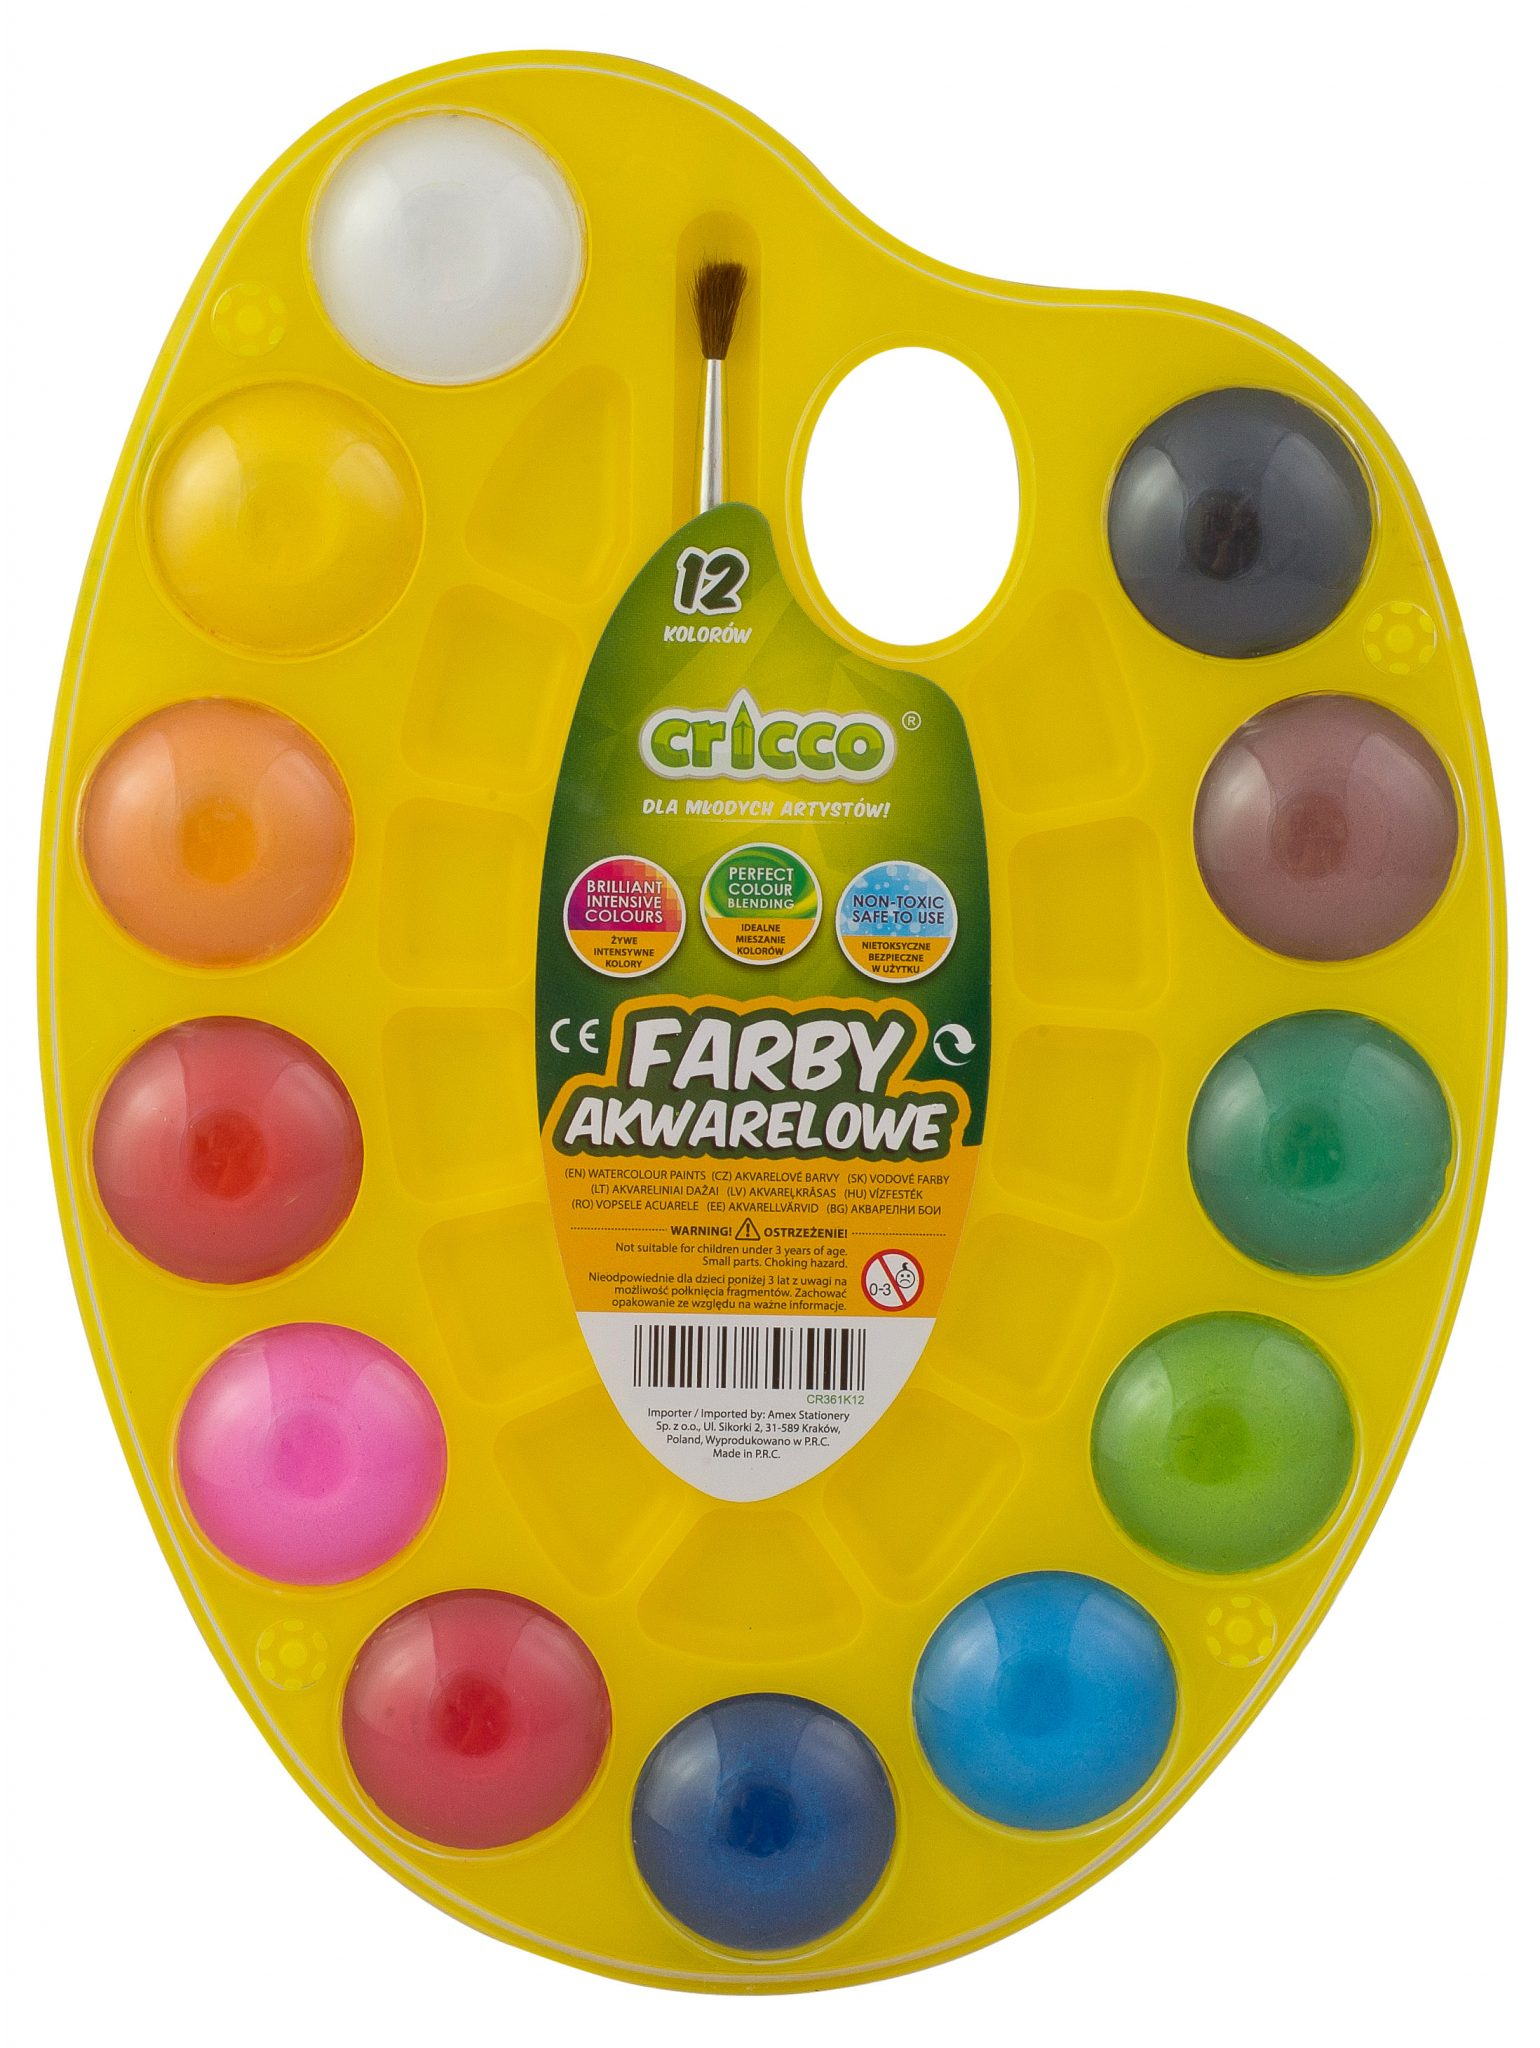 farby akwarelowe Cricco paletka malarska 12 kolorów - CR361K12